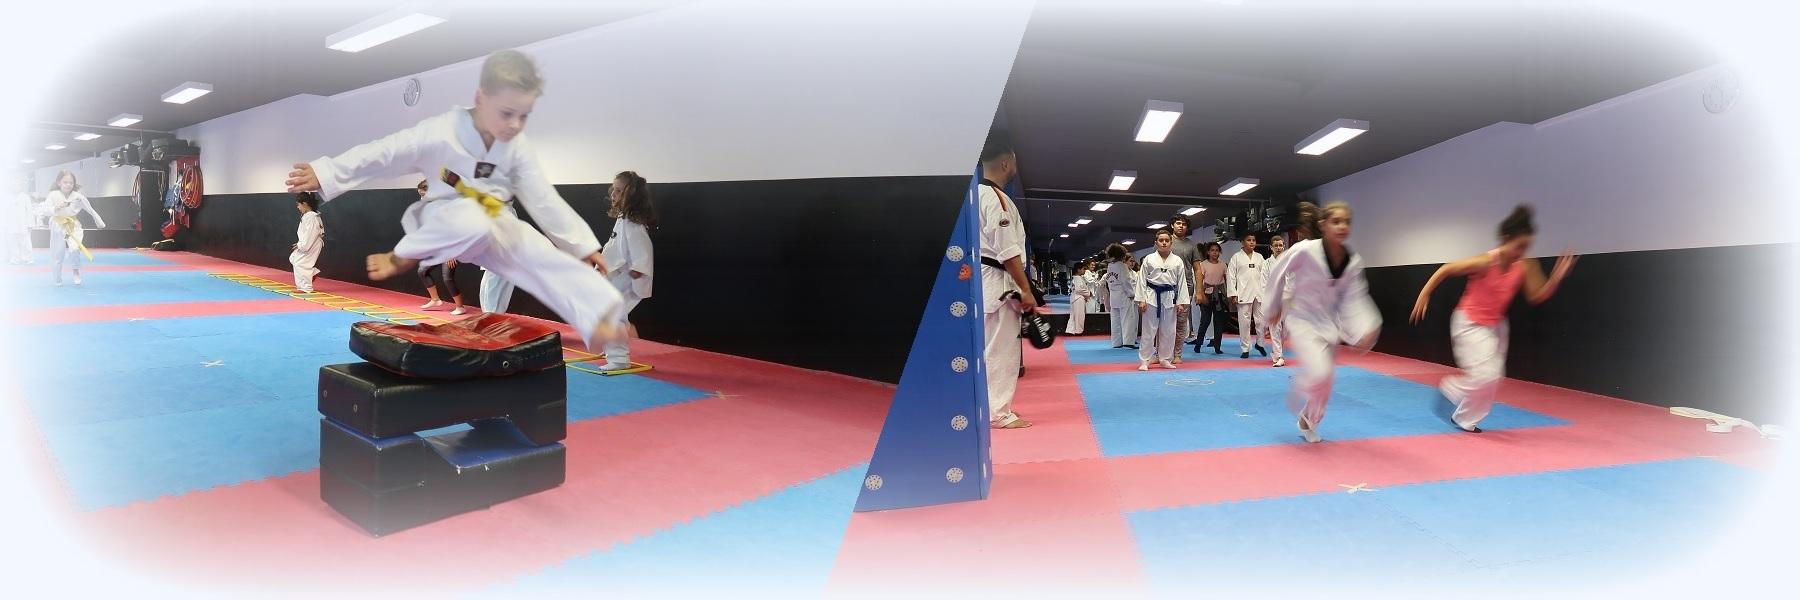 Taekwondo-KuJ-Header-1